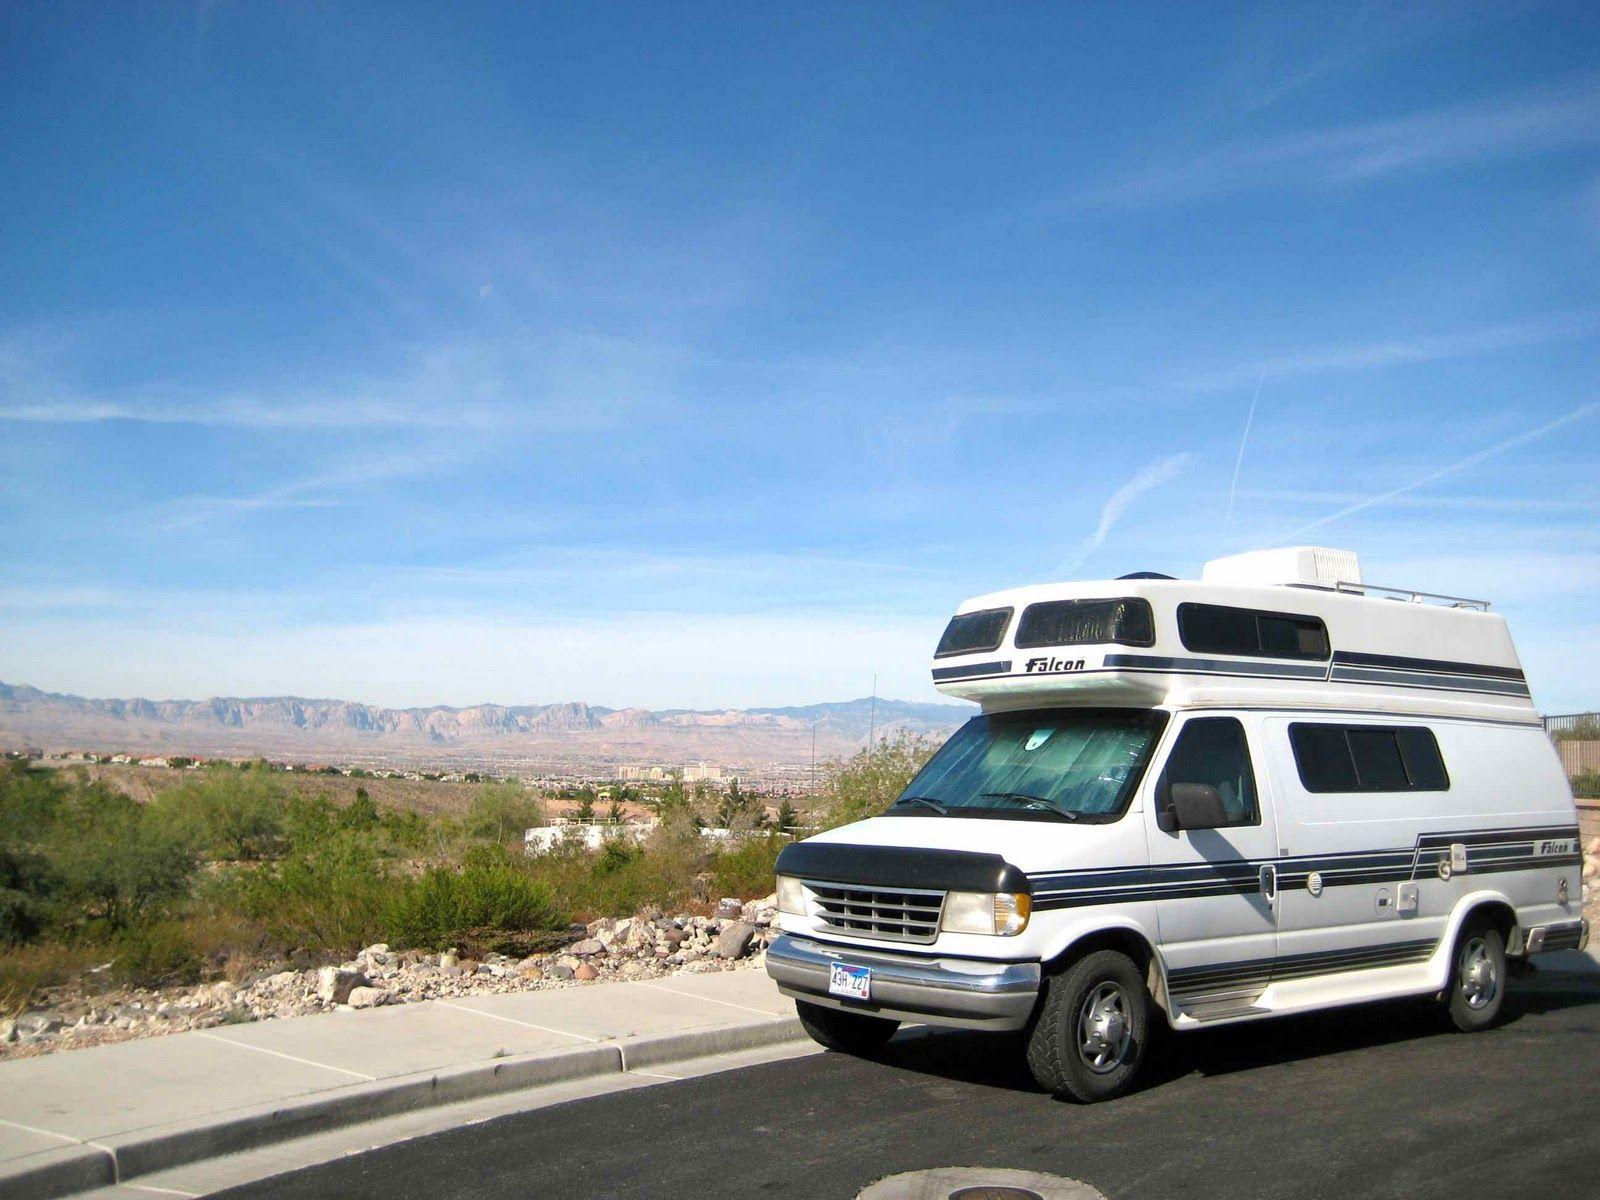 1993 falcon 190 class b camper van built on a 1992 ford e. Black Bedroom Furniture Sets. Home Design Ideas